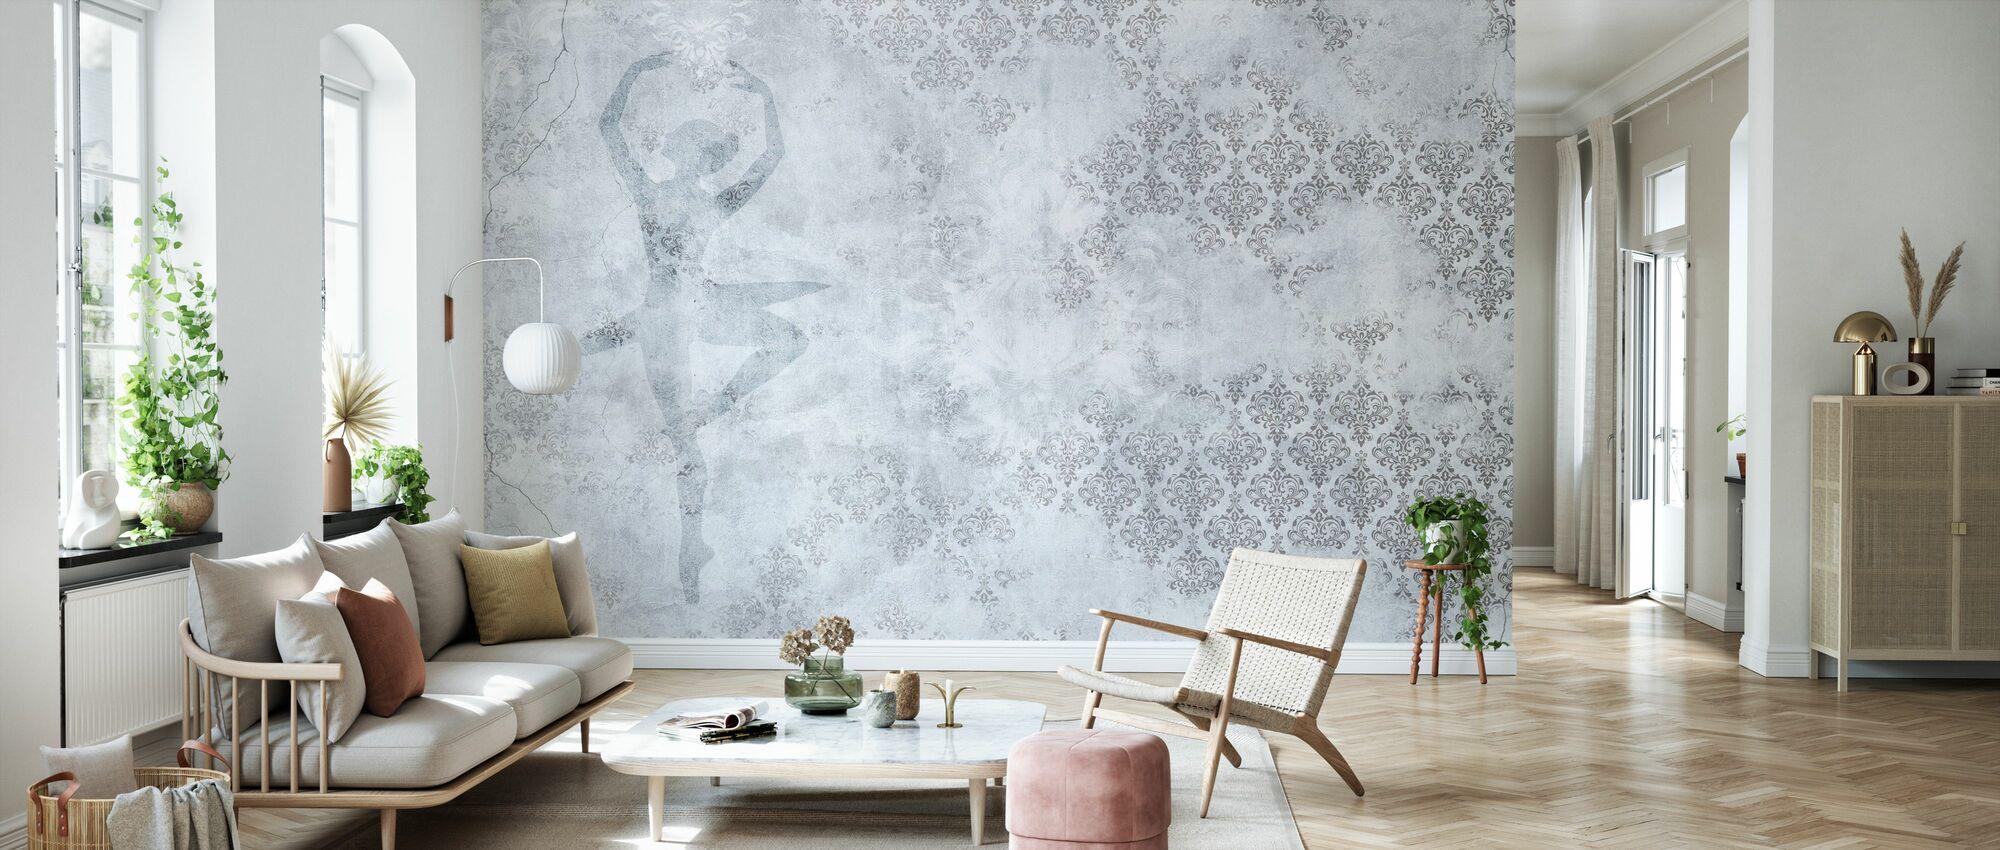 Worn Wall Dancer - Wallpaper - Living Room